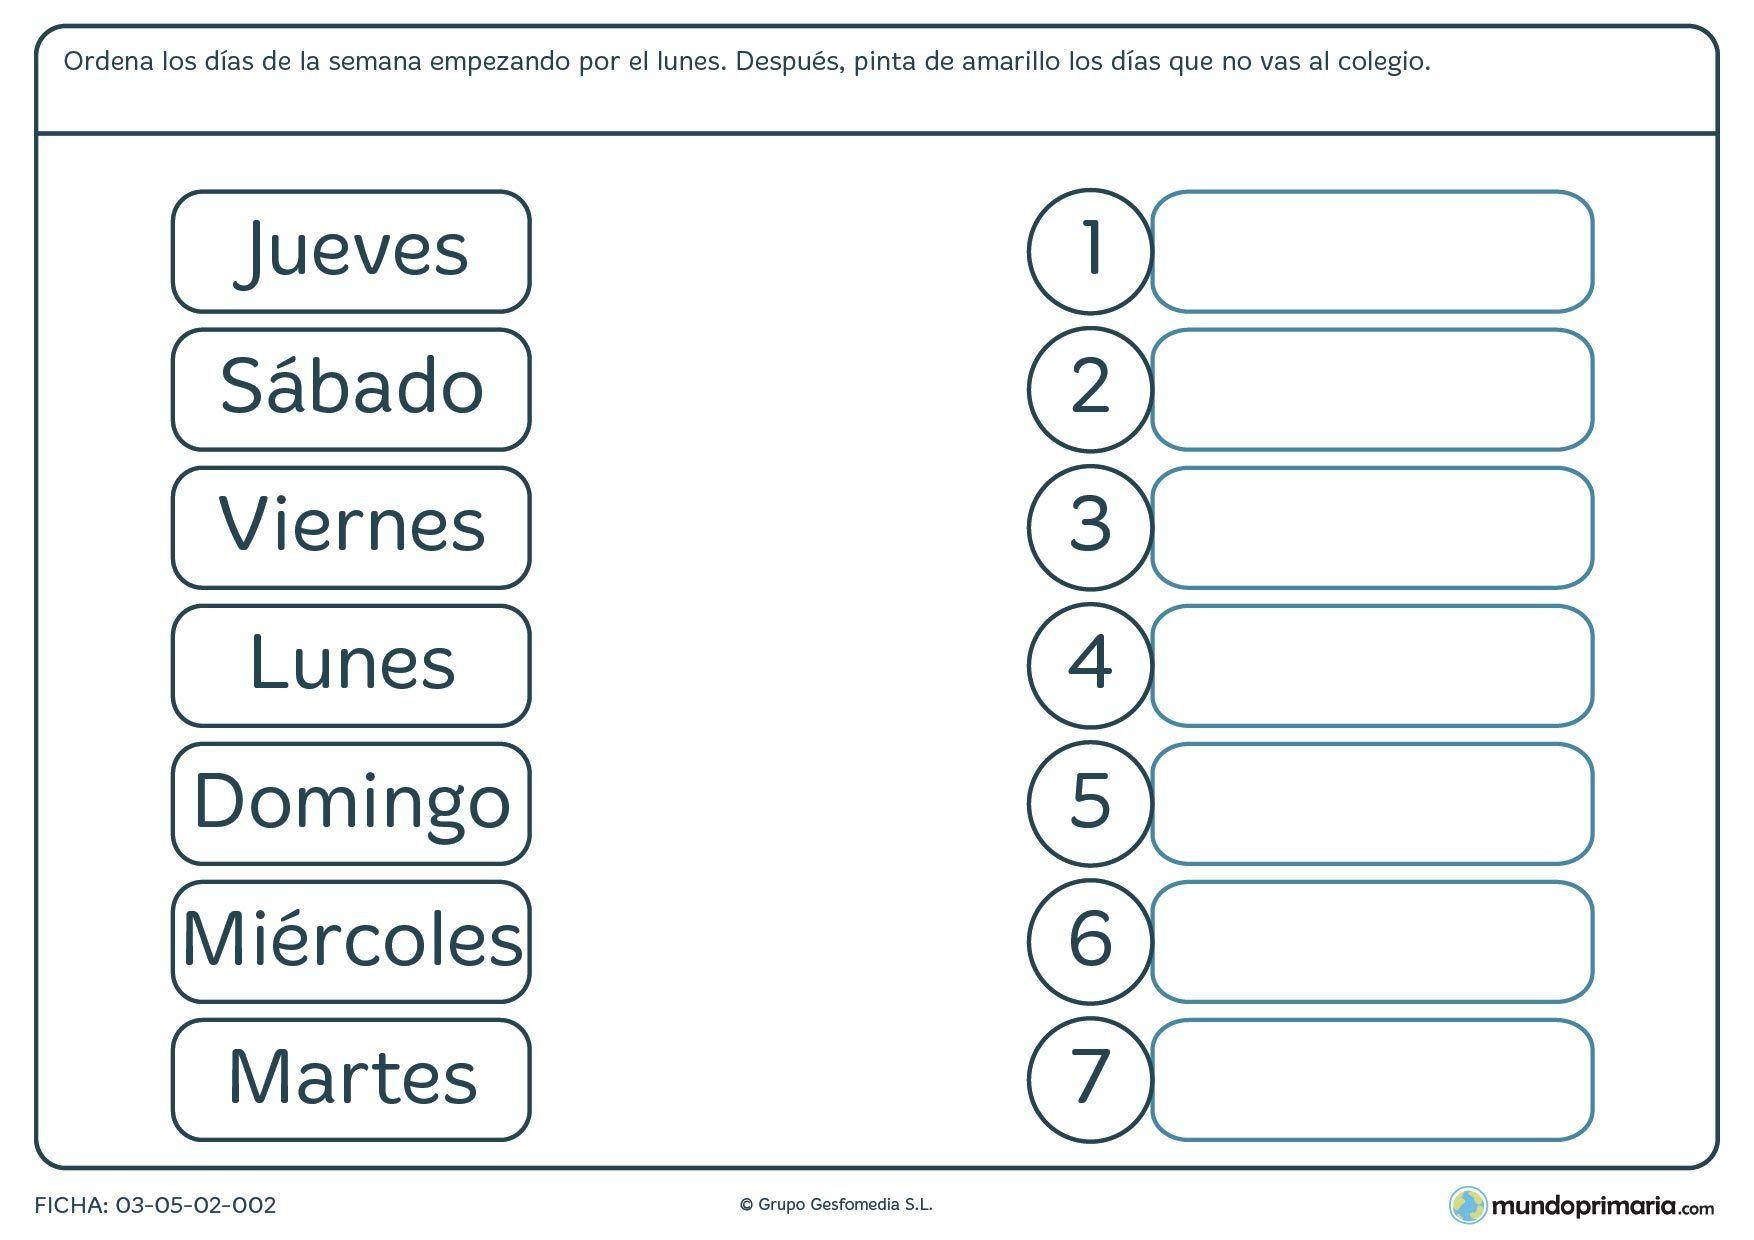 Ficha De Los Dias De La Semana Para Primaria 1 754 1 240 Pixels